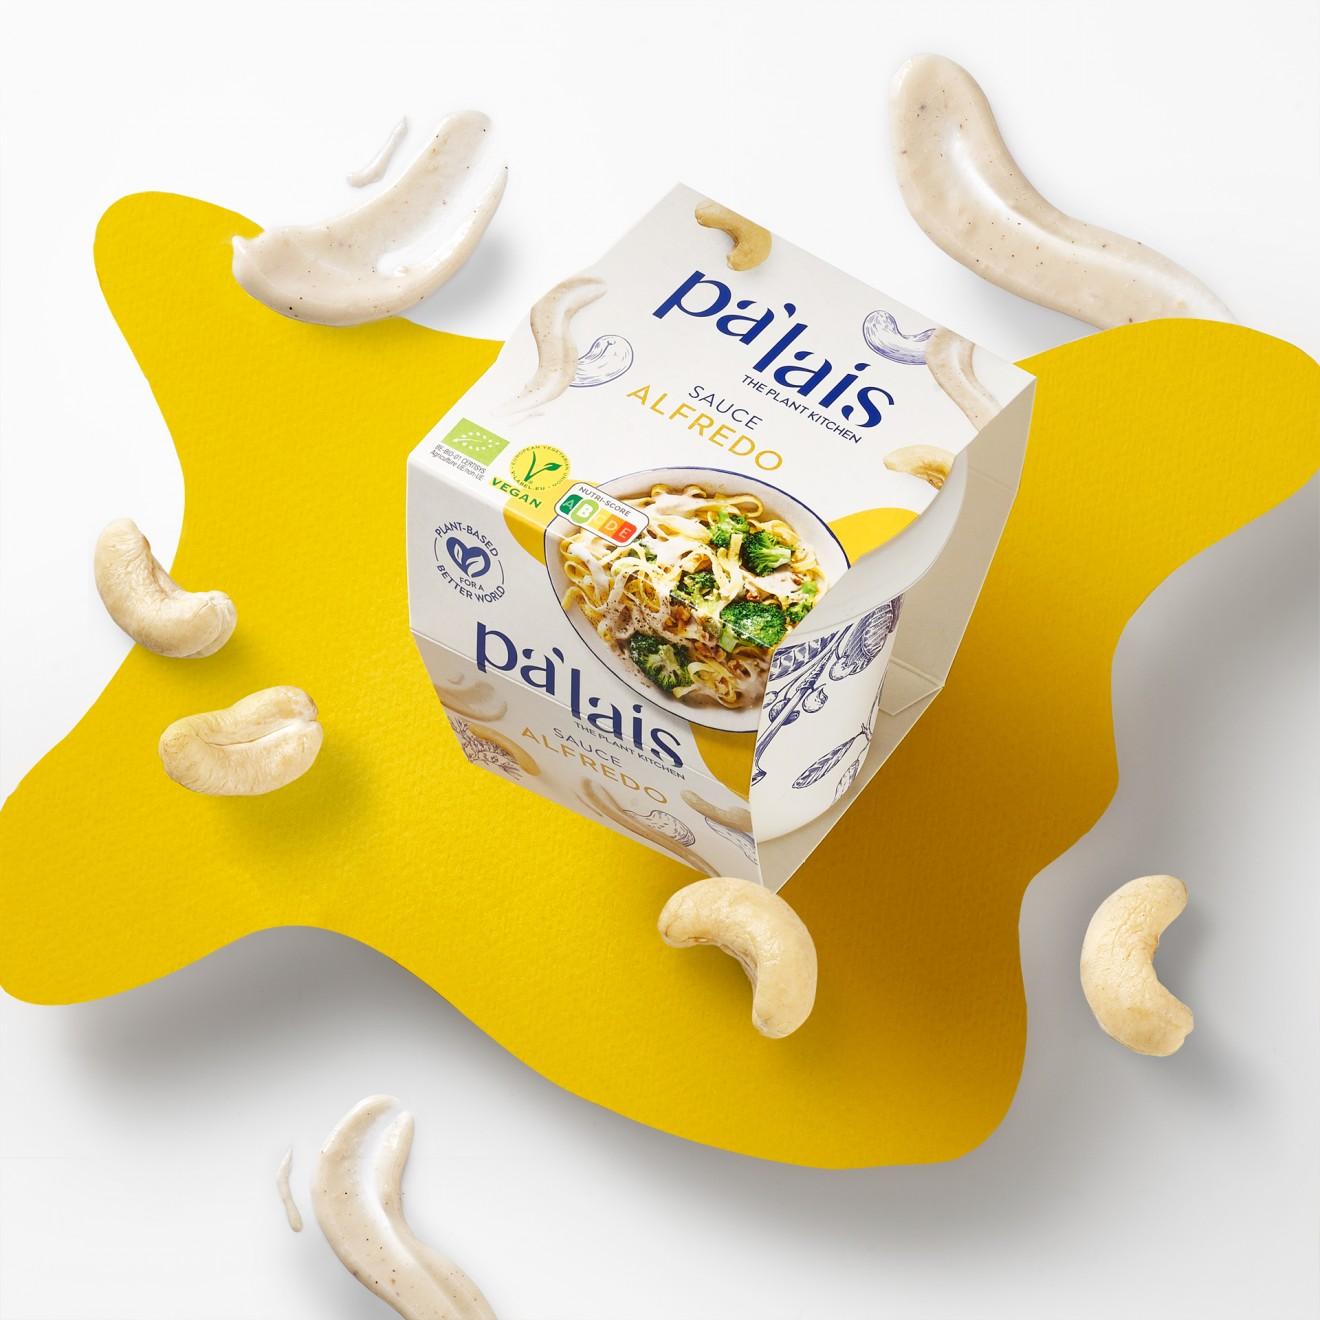 Quatre Mains package design - cheese, alfredo, sauce